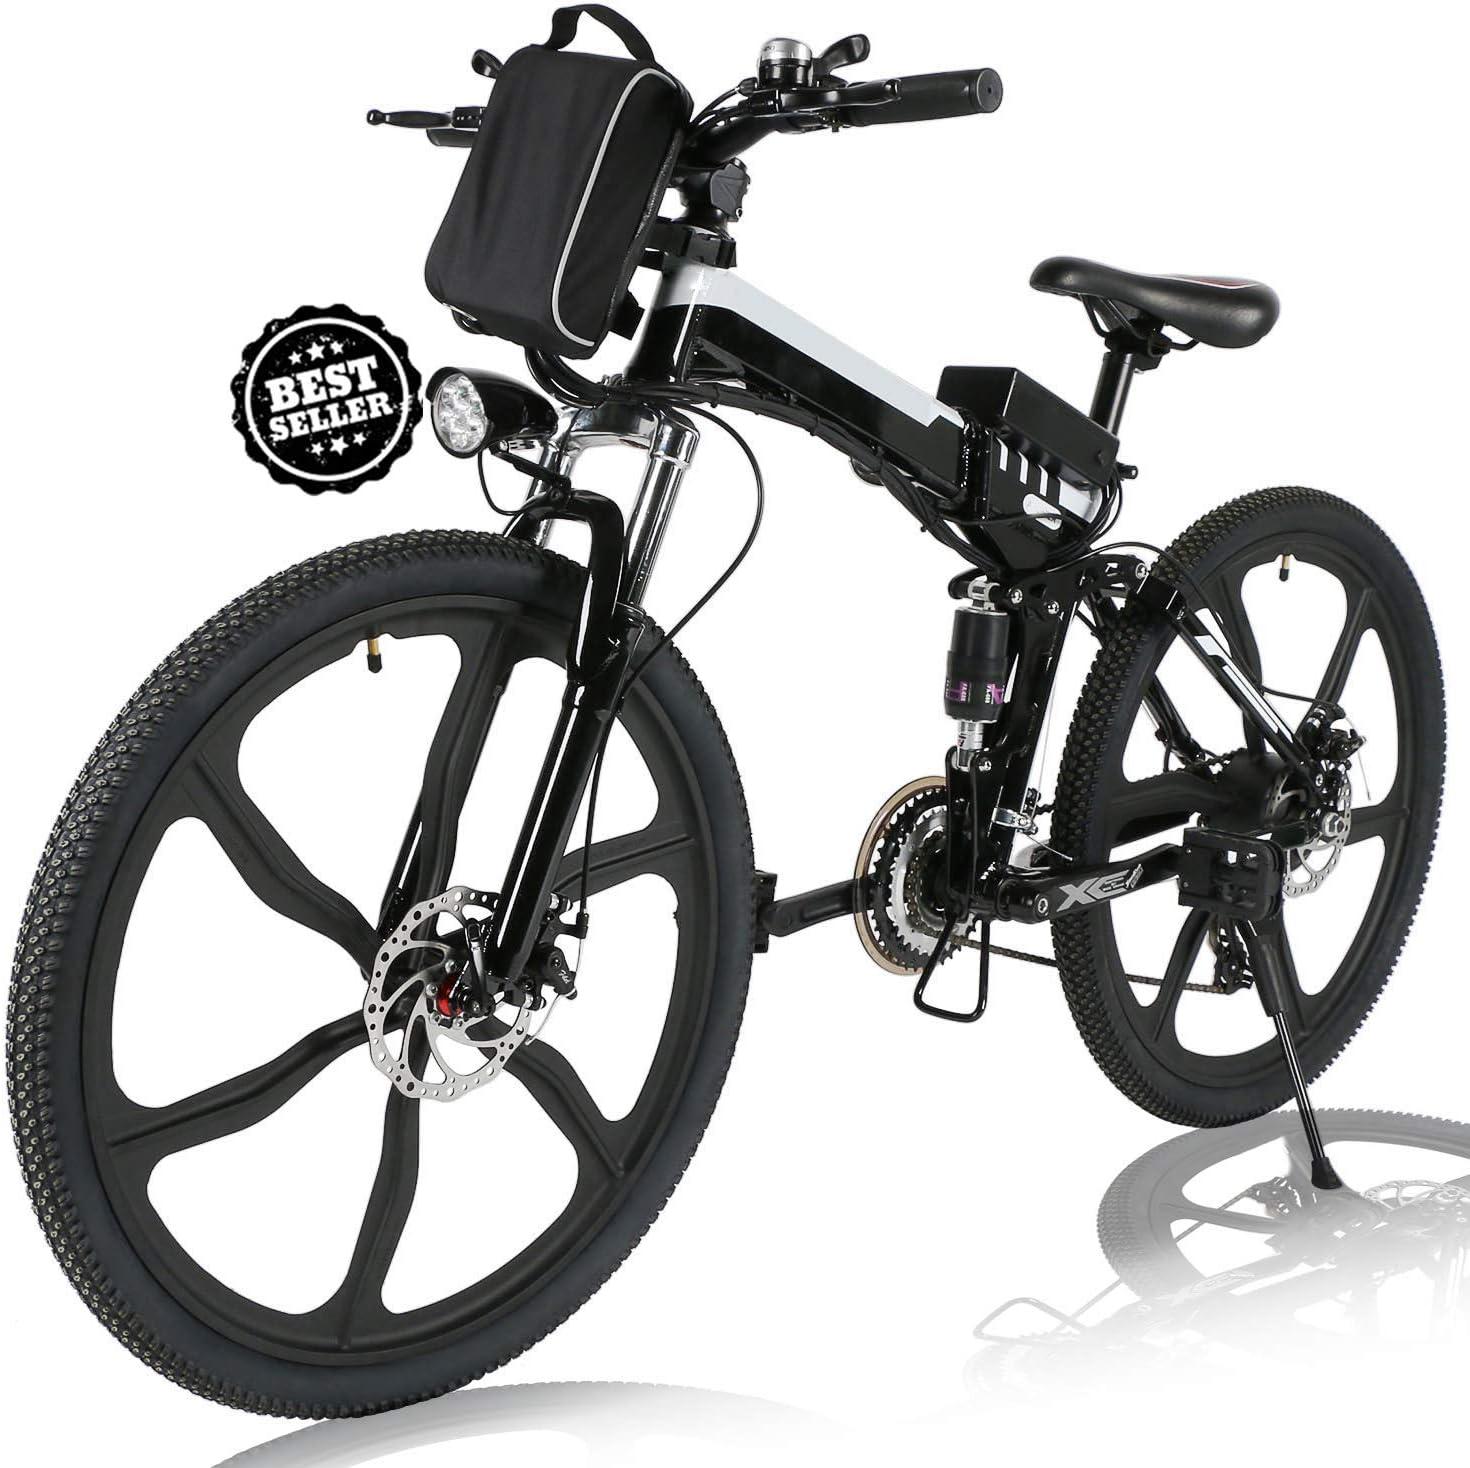 Angotrade 26 inch Don't miss the campaign Detroit Mall Folding Electric Bike E-Bike Mountain 21 Speed